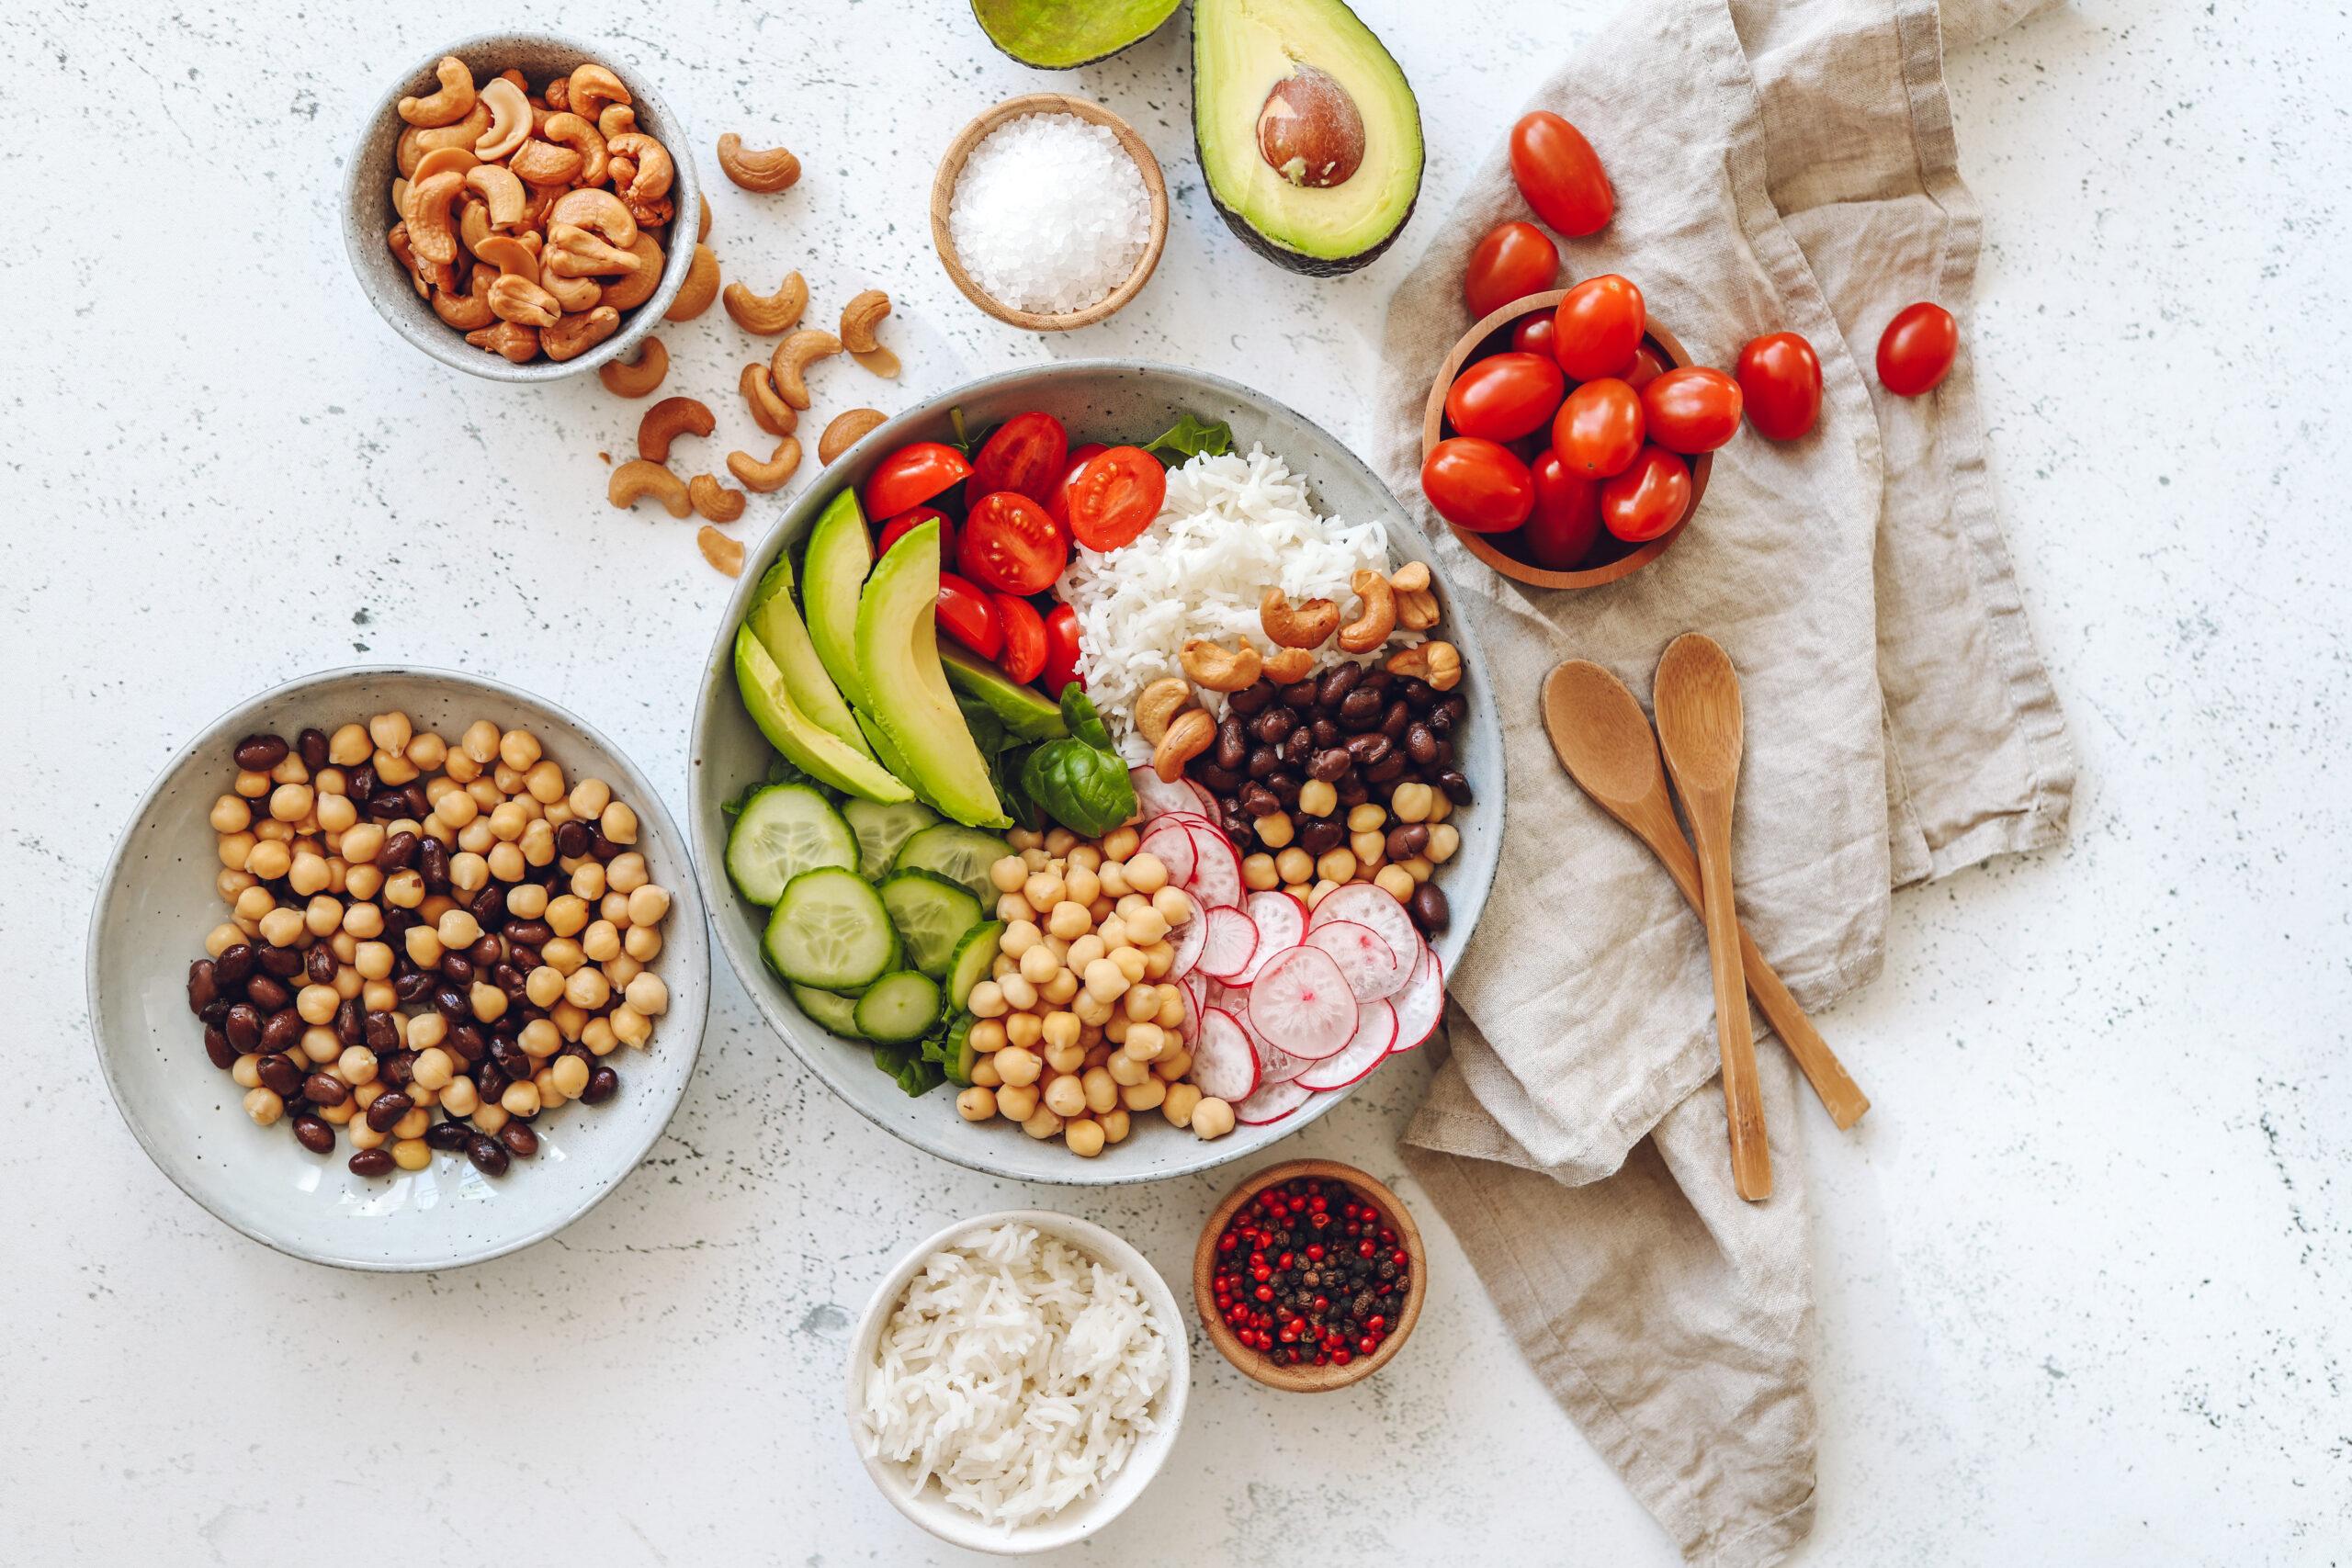 Groentebowl Met Basmati, Avocado En Cherrytomaten